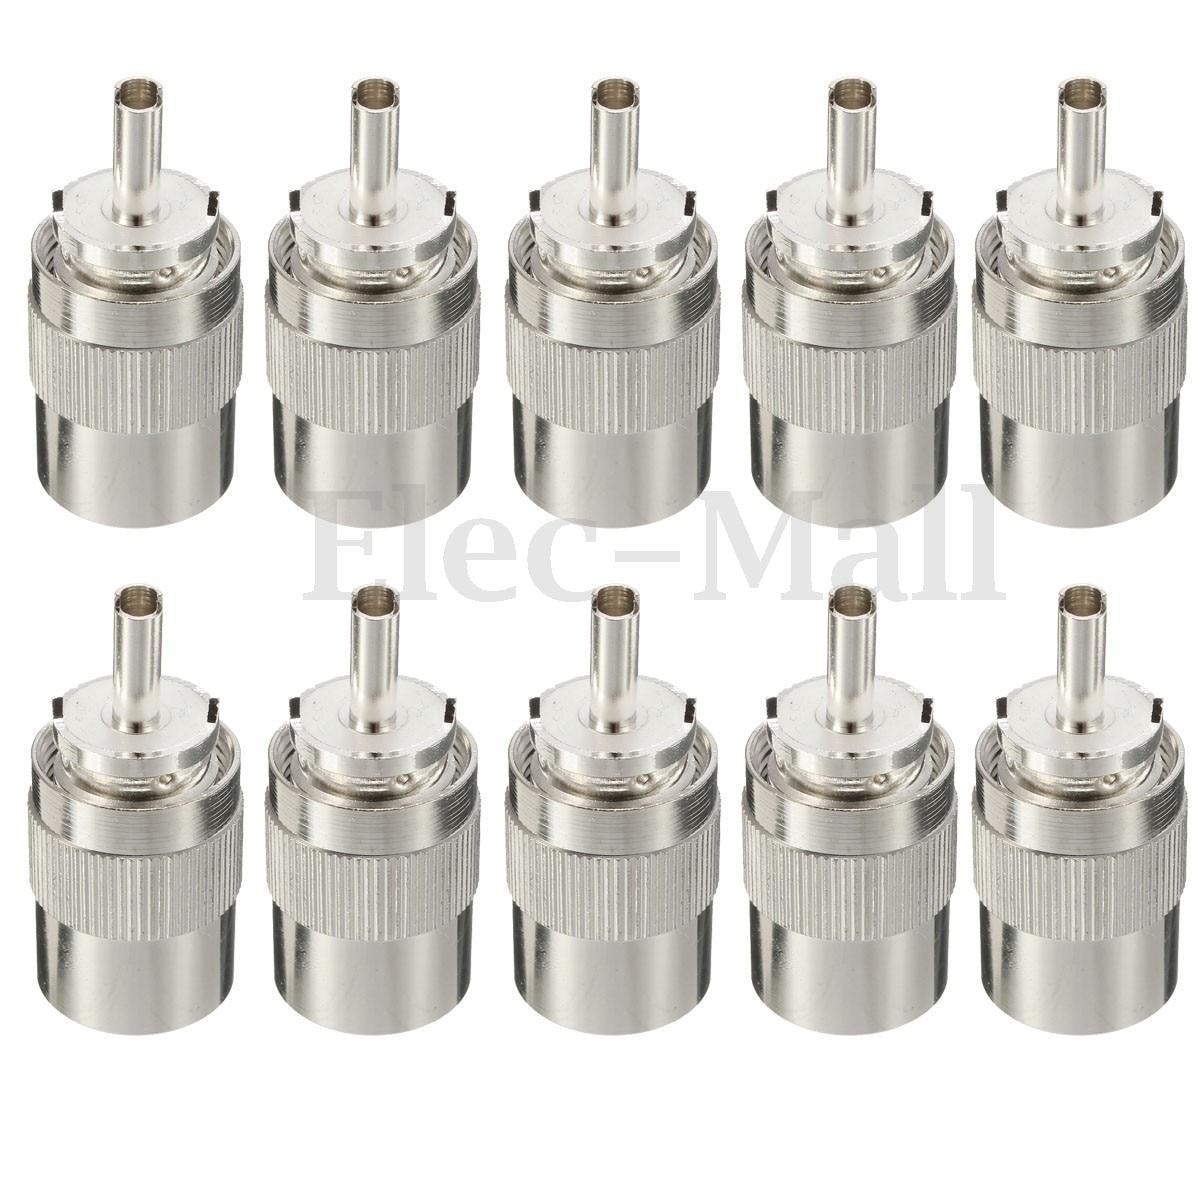 10pcs Connector UHF Male PL259 Plug Solder RG8 RG213 LMR400 7D-FB Cable Silver areyourshop 10pcs n clamp plug male rf coaxial connector cable for lmr400 rg8 rg213 converter mini